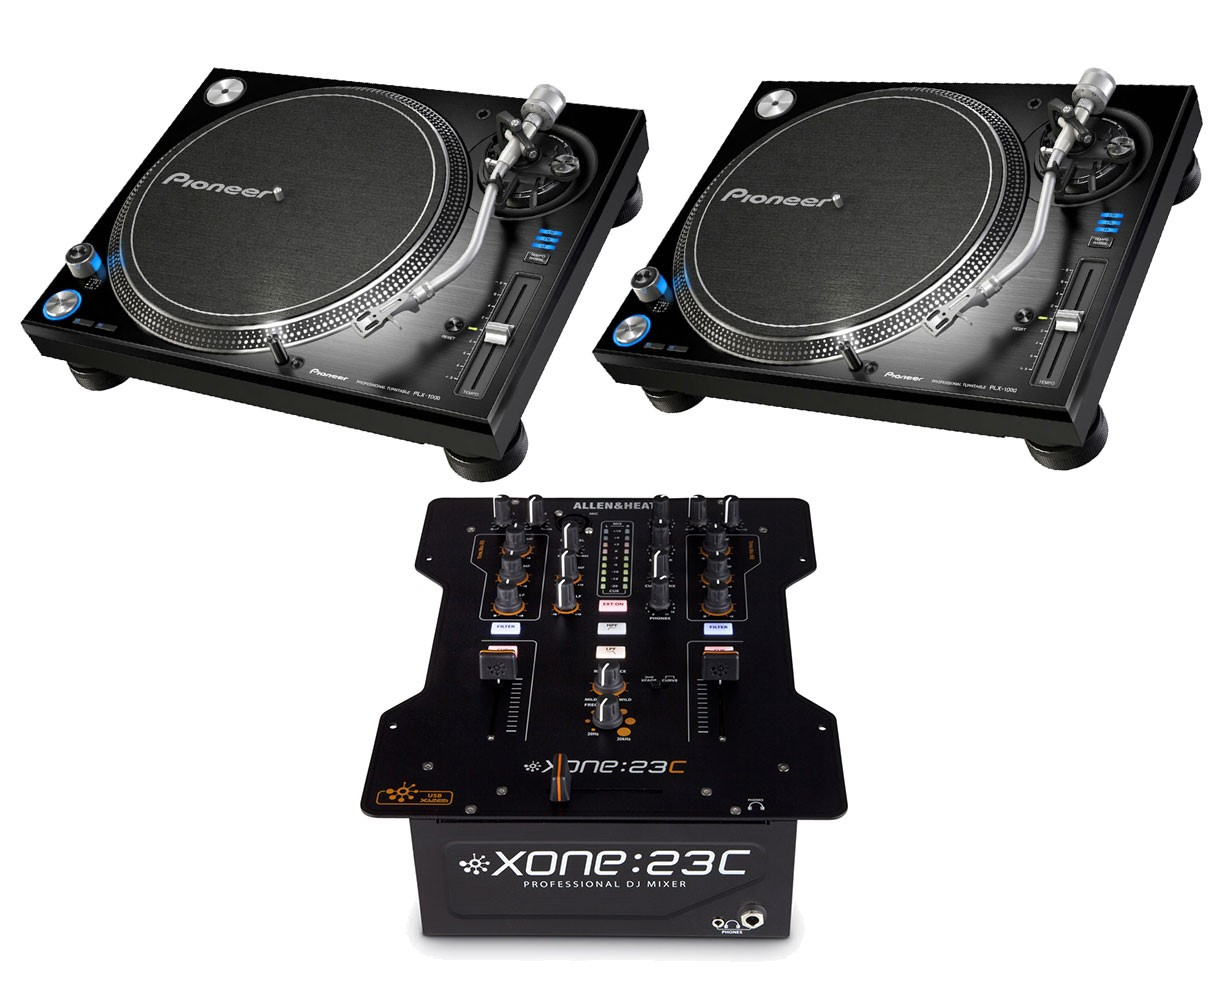 2x Pioneer PLX-1000 + Xone:23C